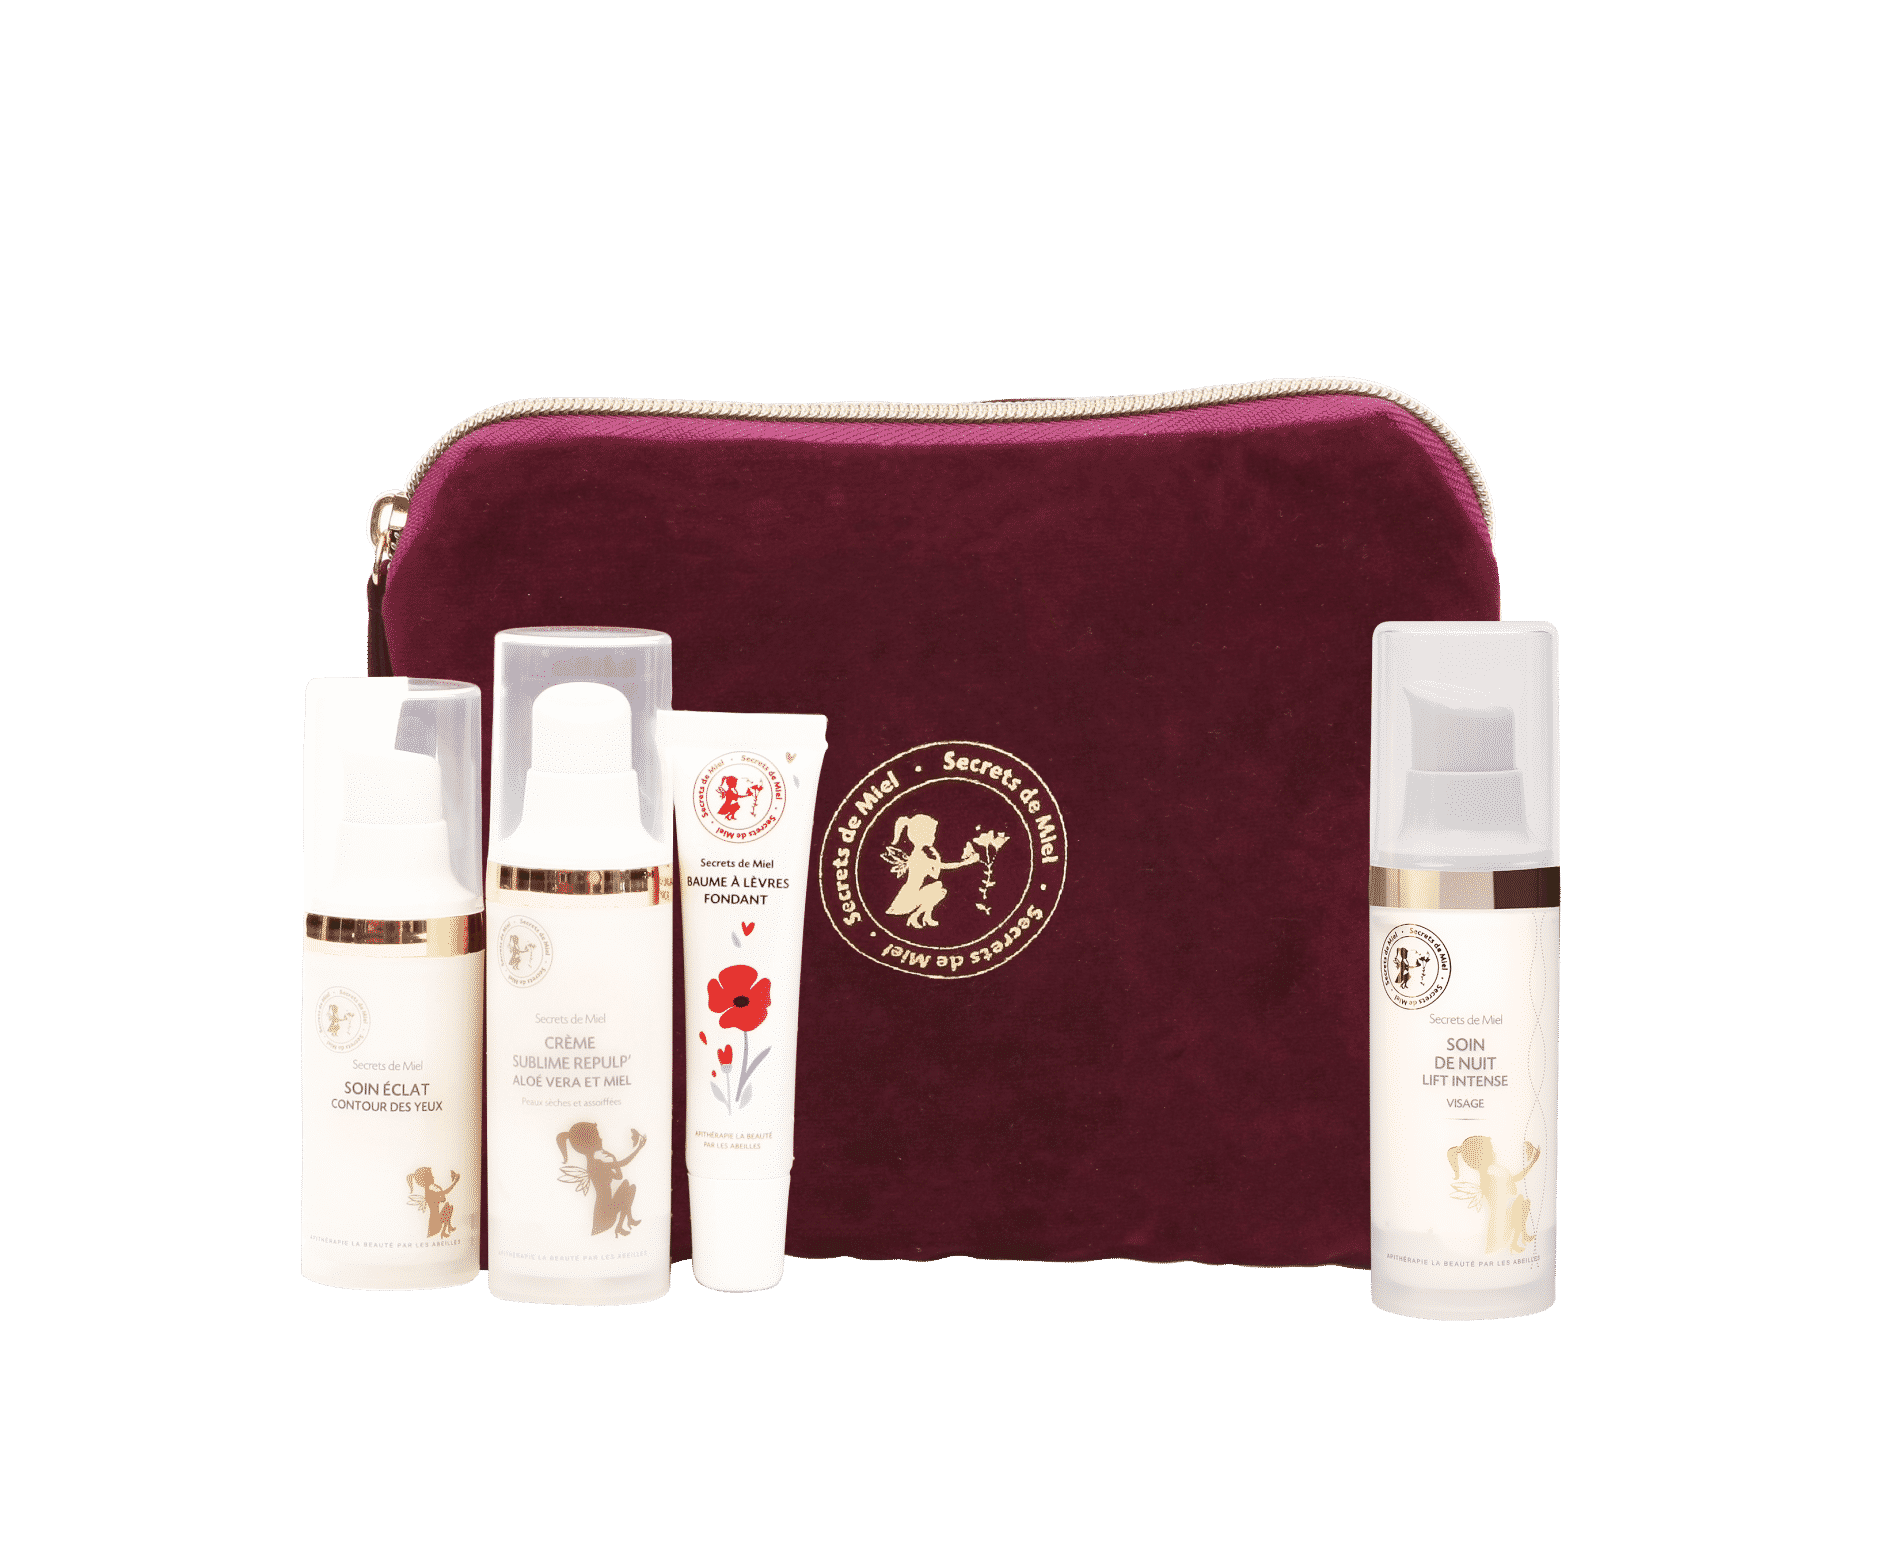 coffret cadeau cosmétiques made in France - Secrets de Miel